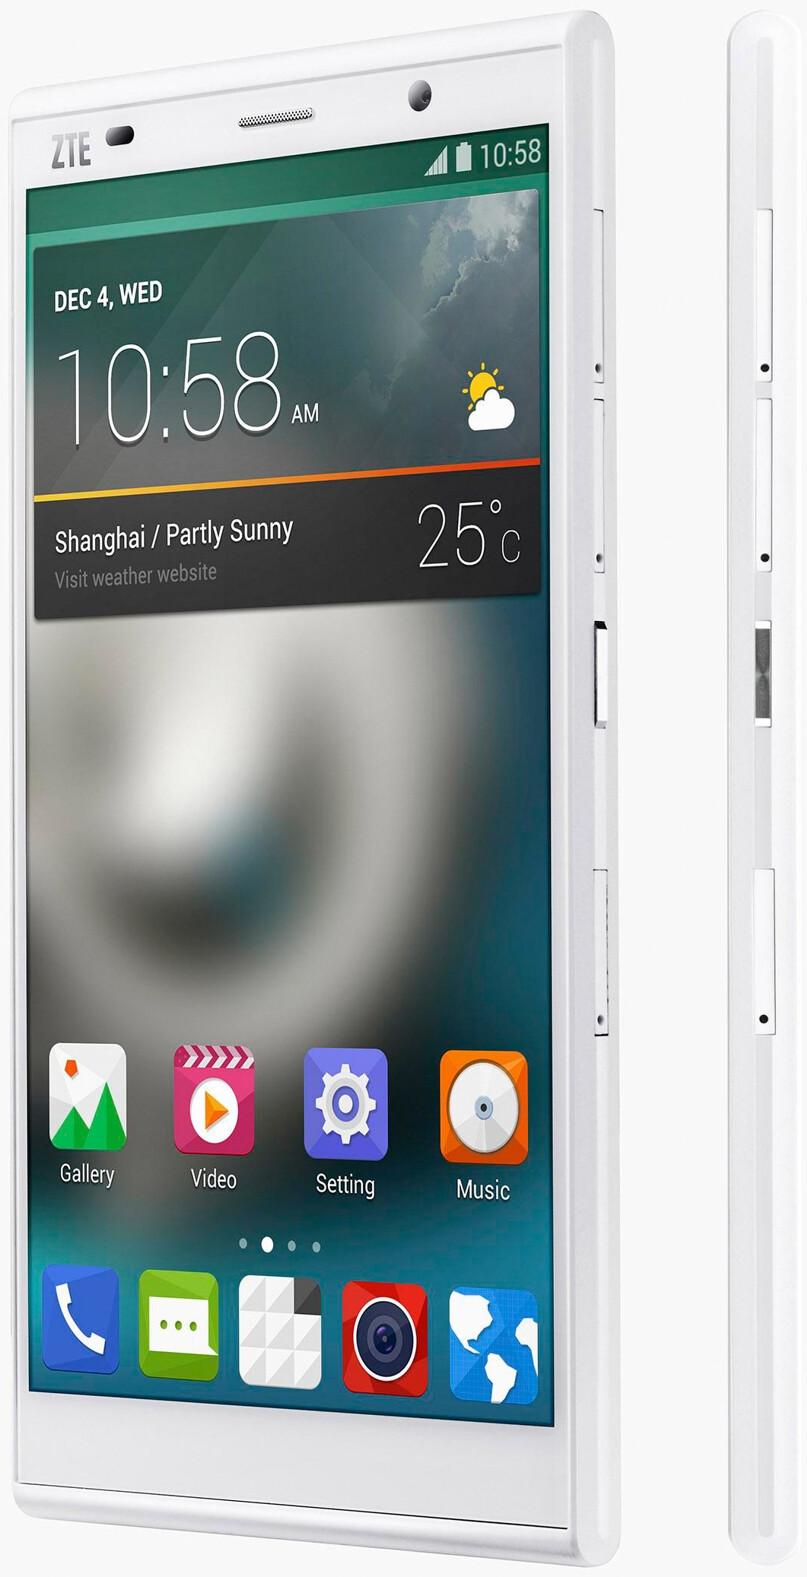 ZTE intros Grand Memo II LTE: Android 4.4 KitKat, 80% screen